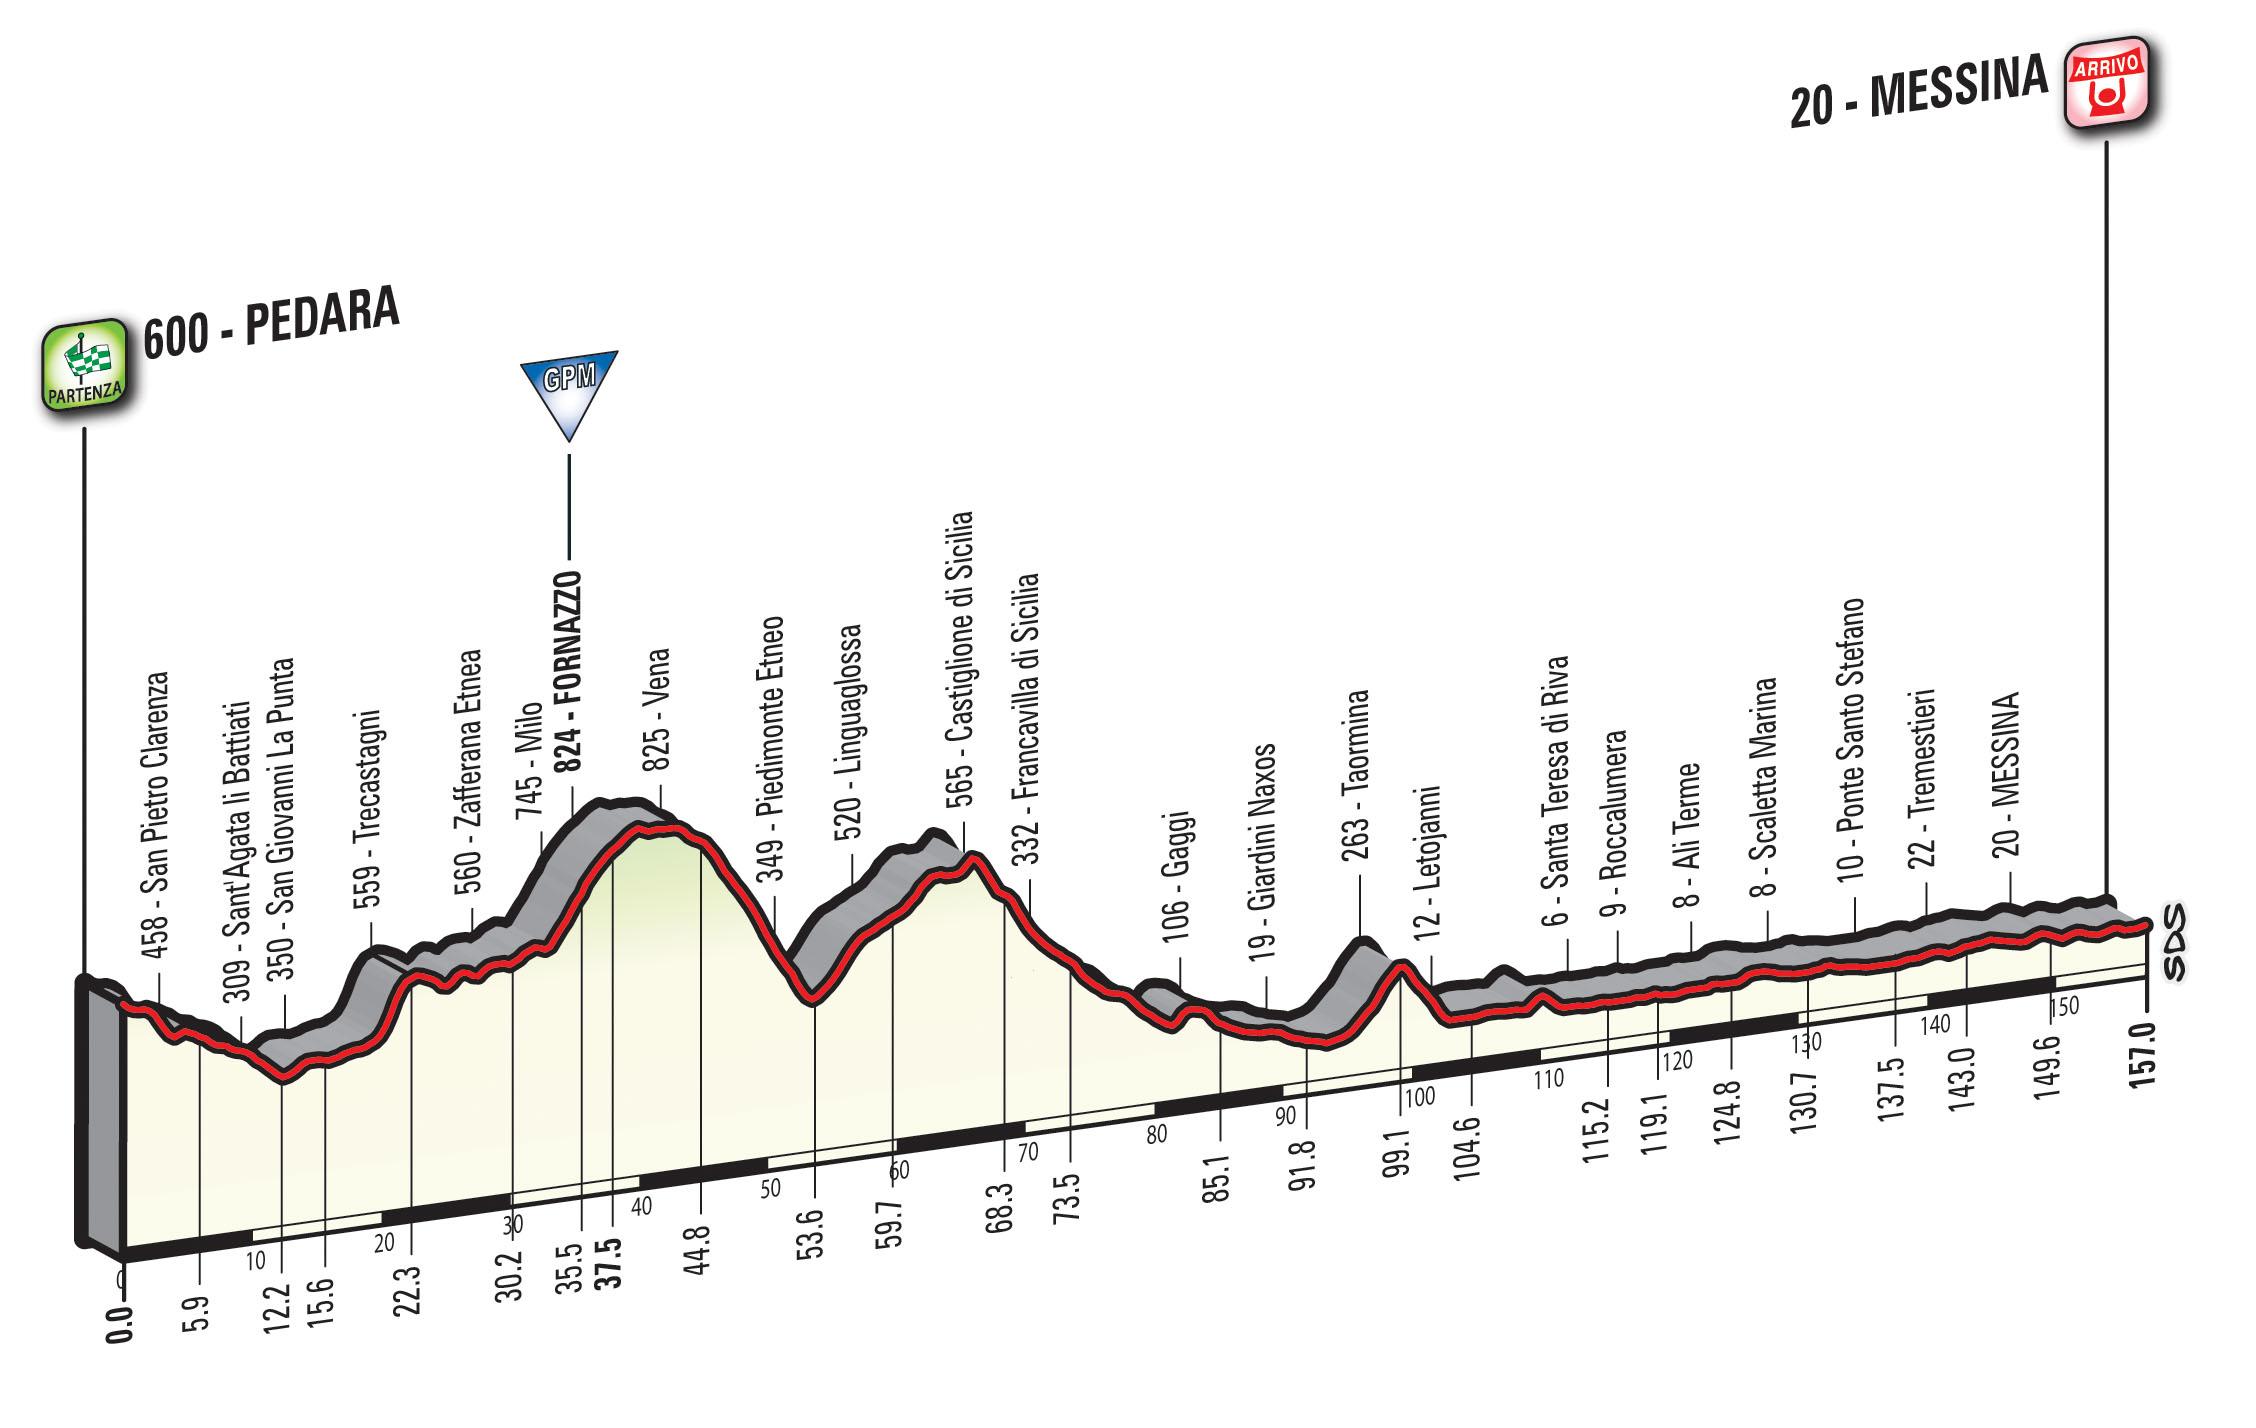 Giro d'Italia Pedara-Messina